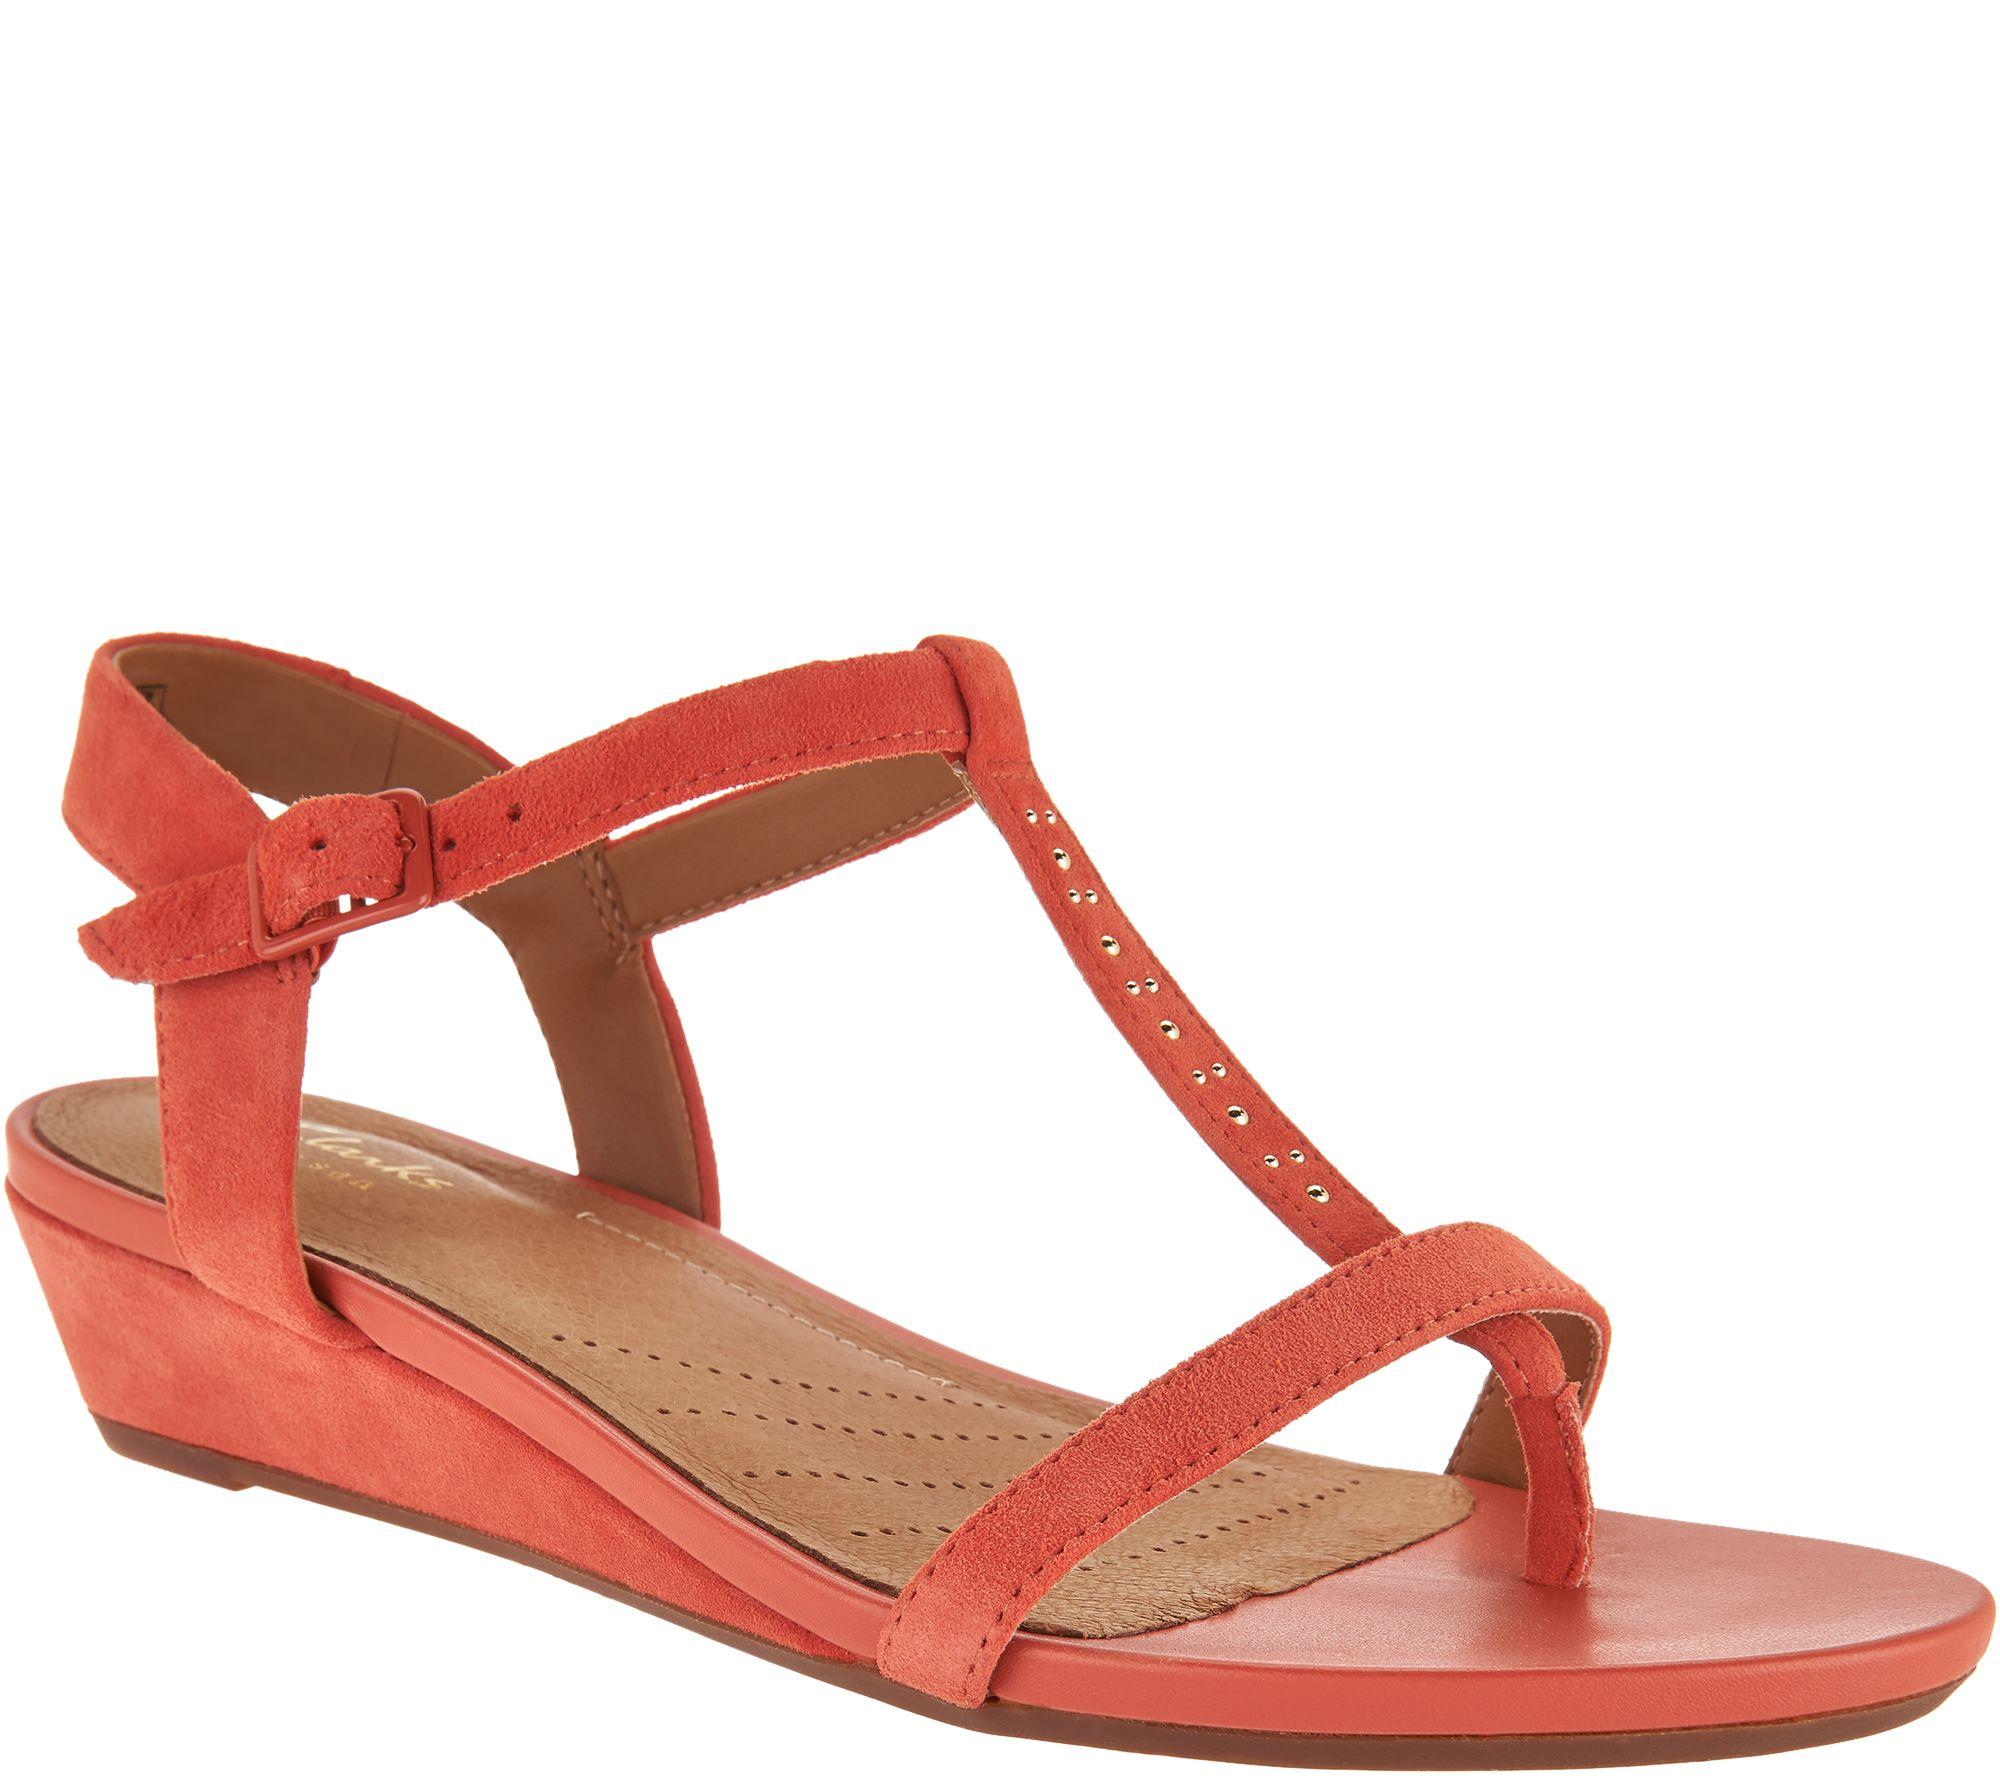 Black wedge sandals 2 inch heel - Clarks Artisan Suede Low Wedge Sandals Parram Blanc A291411